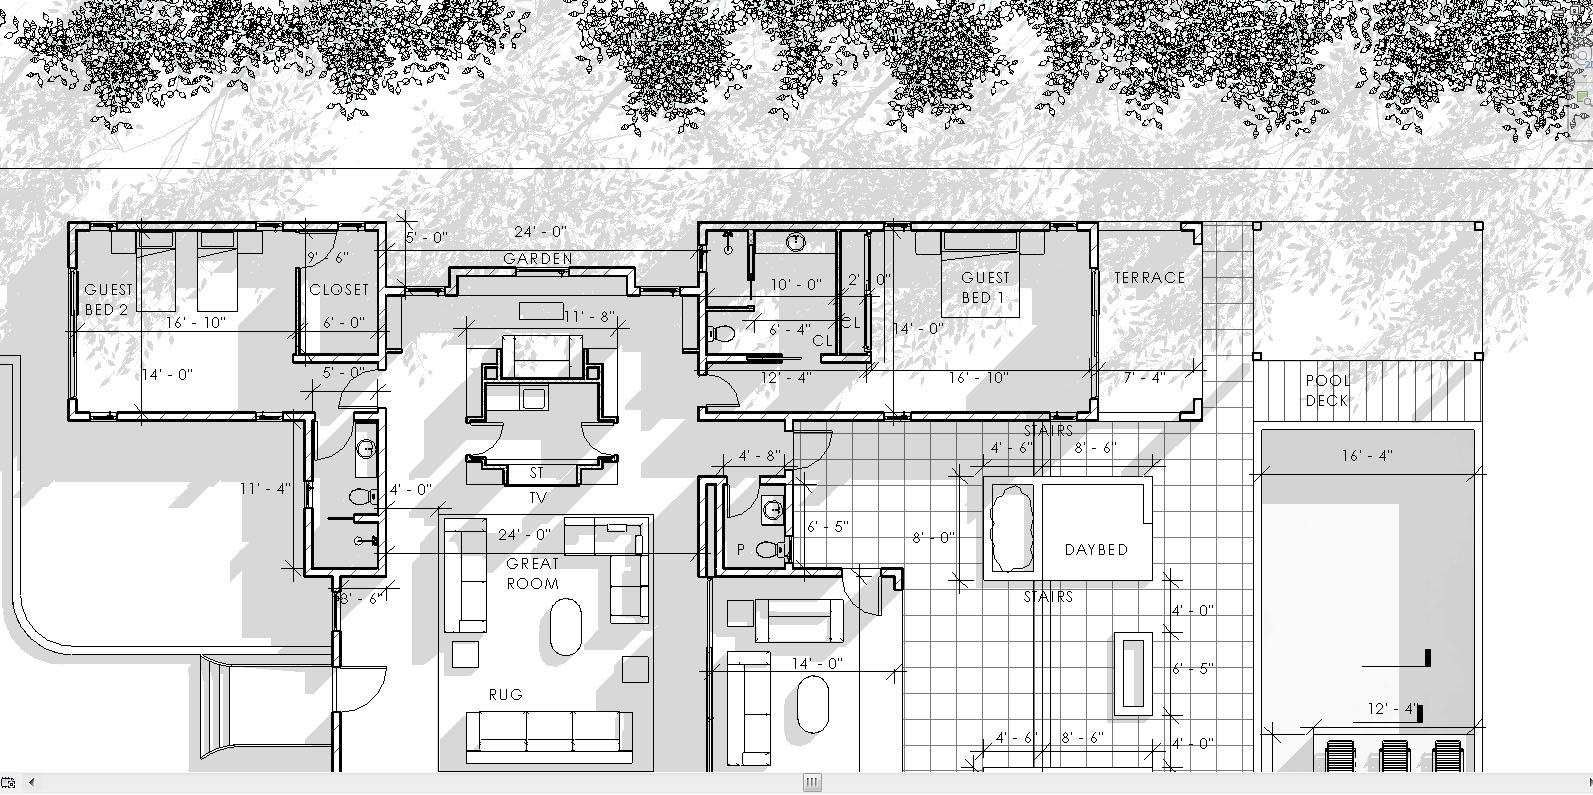 Autodesk Floor Plan Solved Shadows Problem Autodesk Community